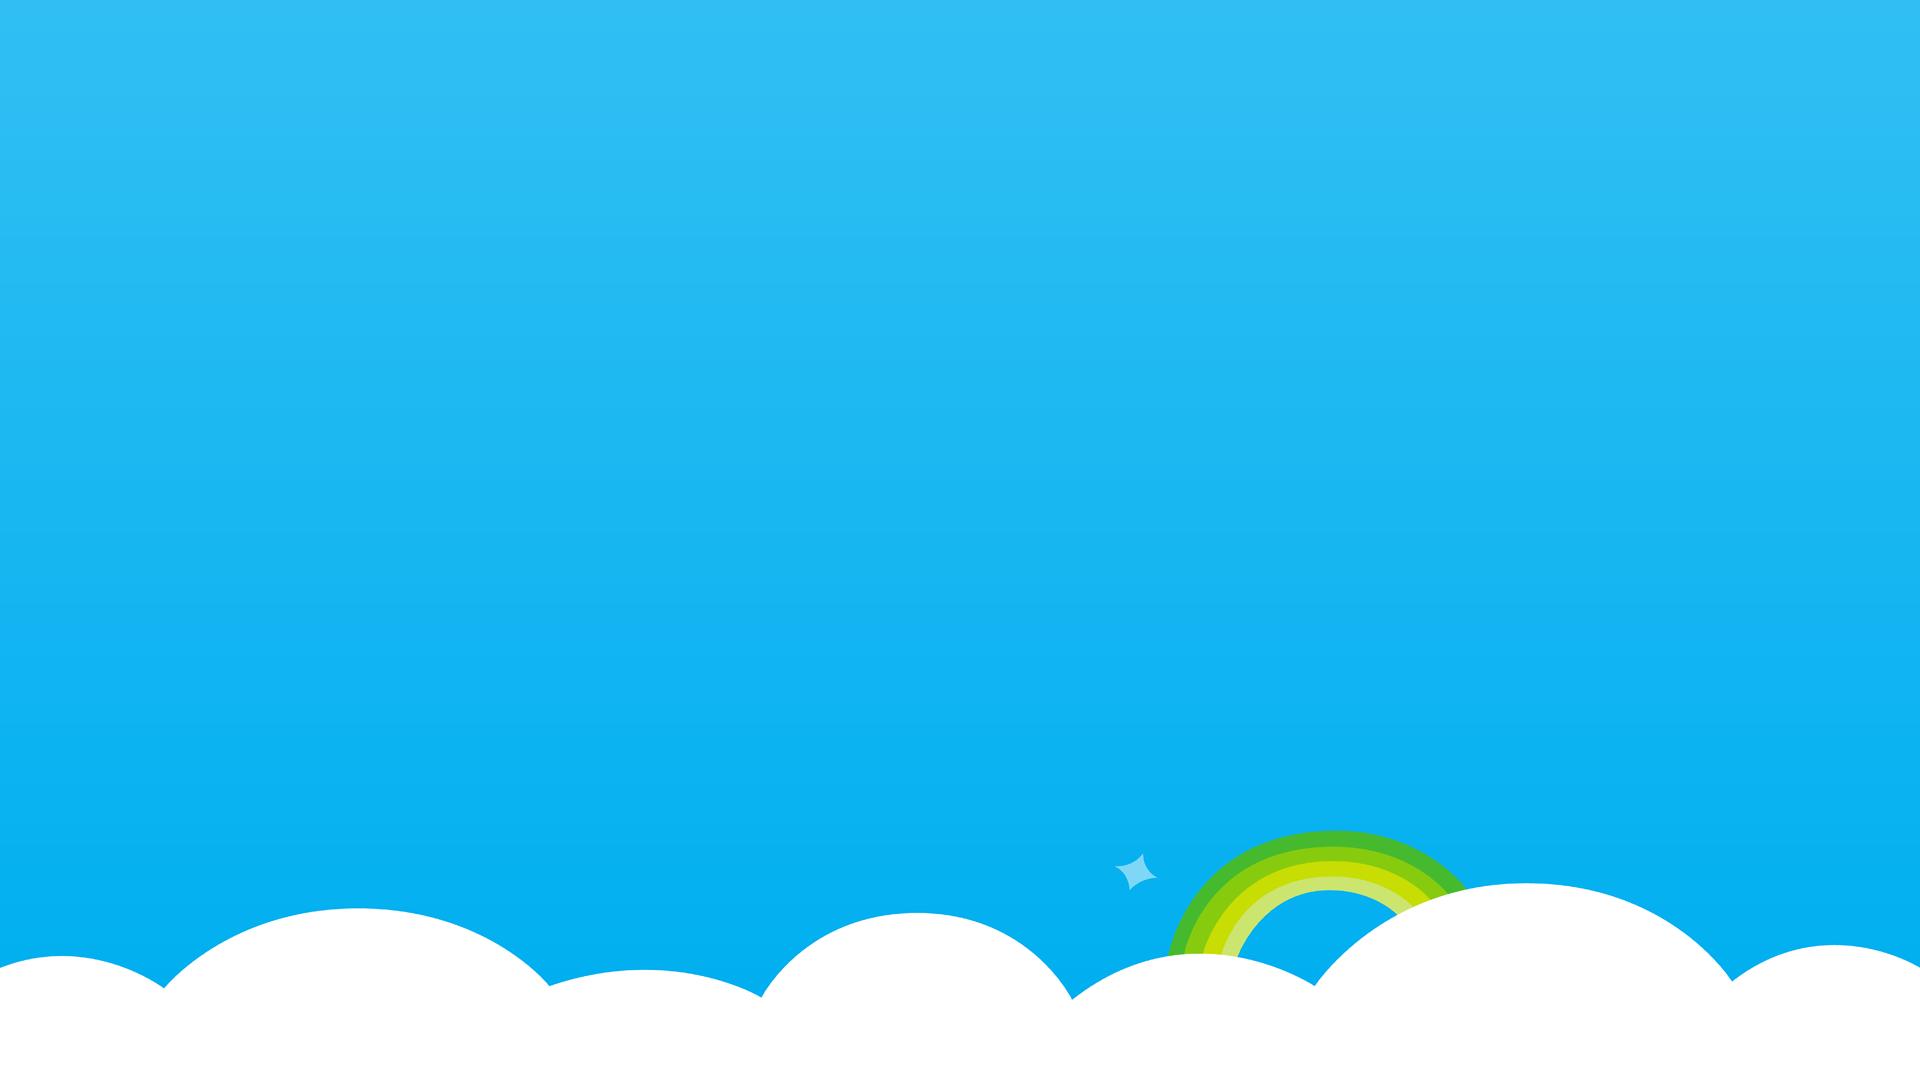 Skype Wallpaper 1